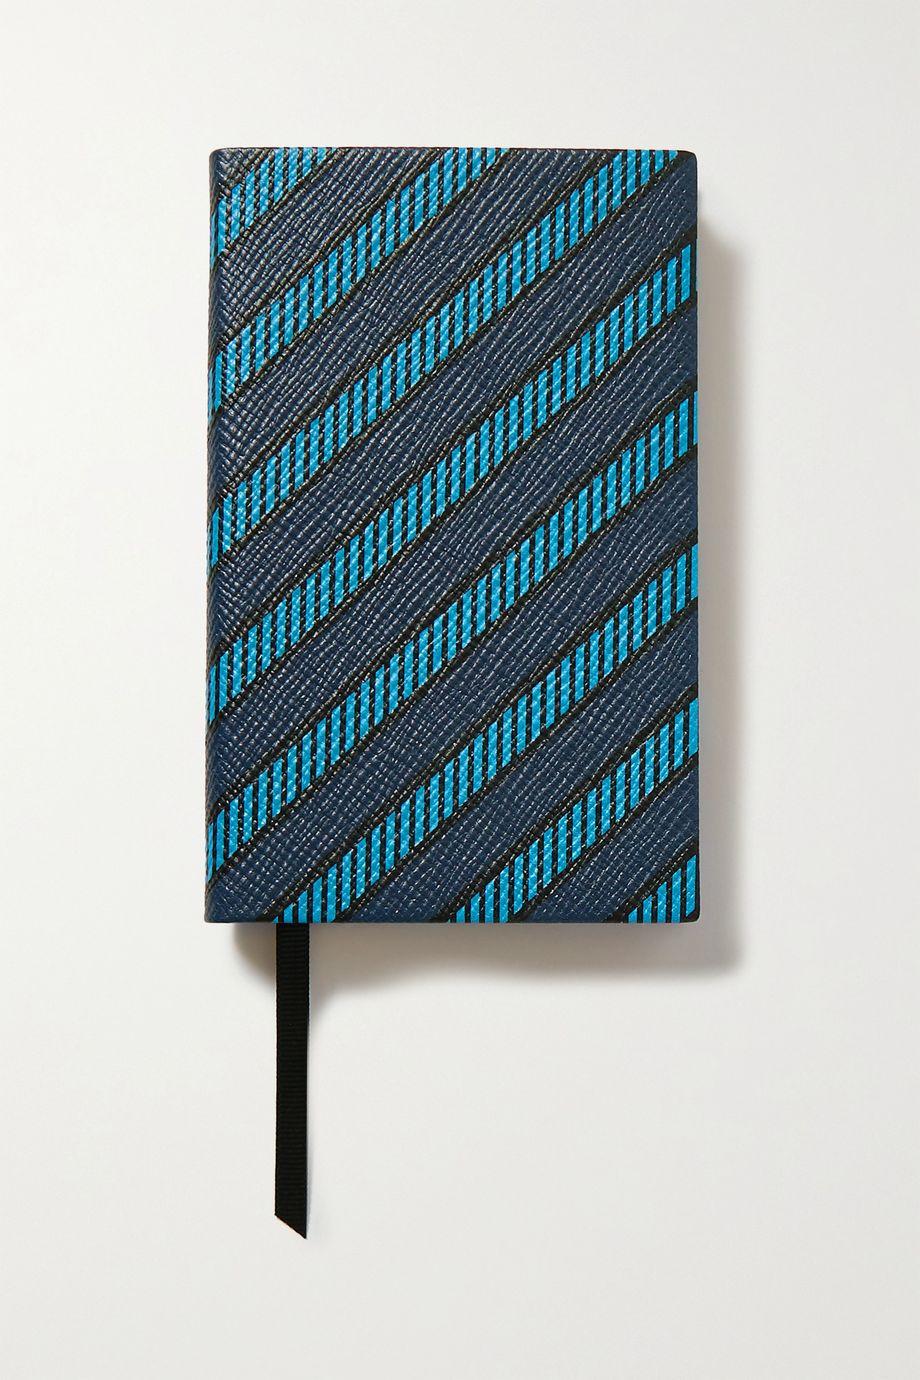 Smythson Panama printed textured-leather notebook